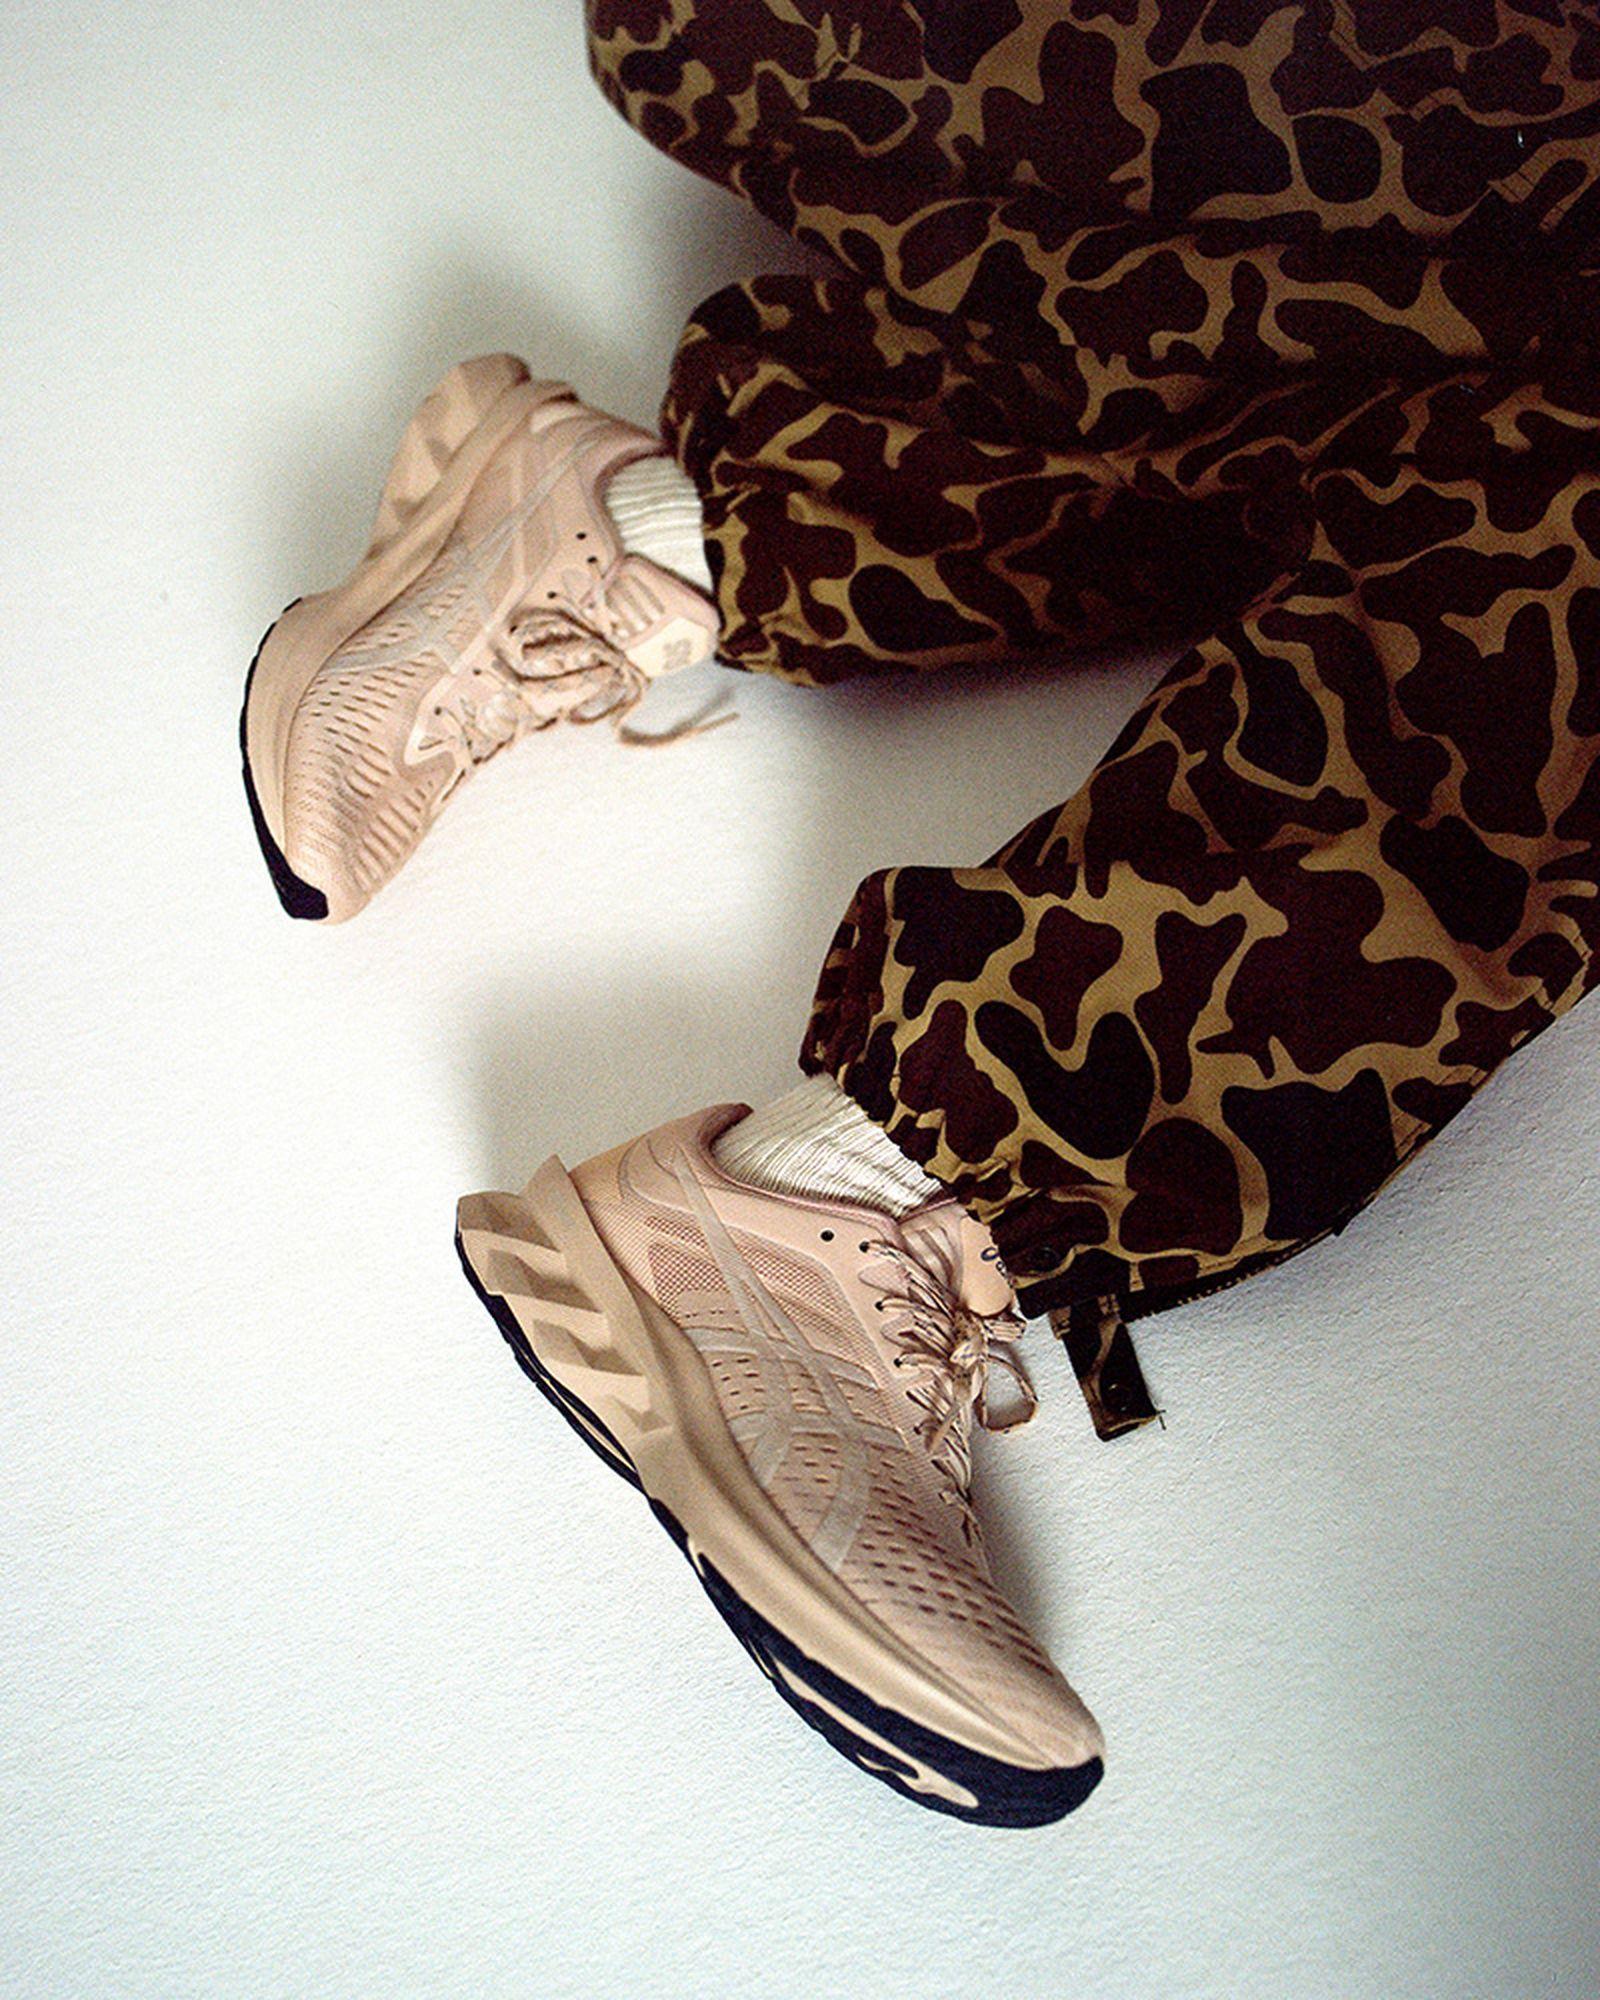 sneakersnstuff-asics-novablast-release-date-price-09